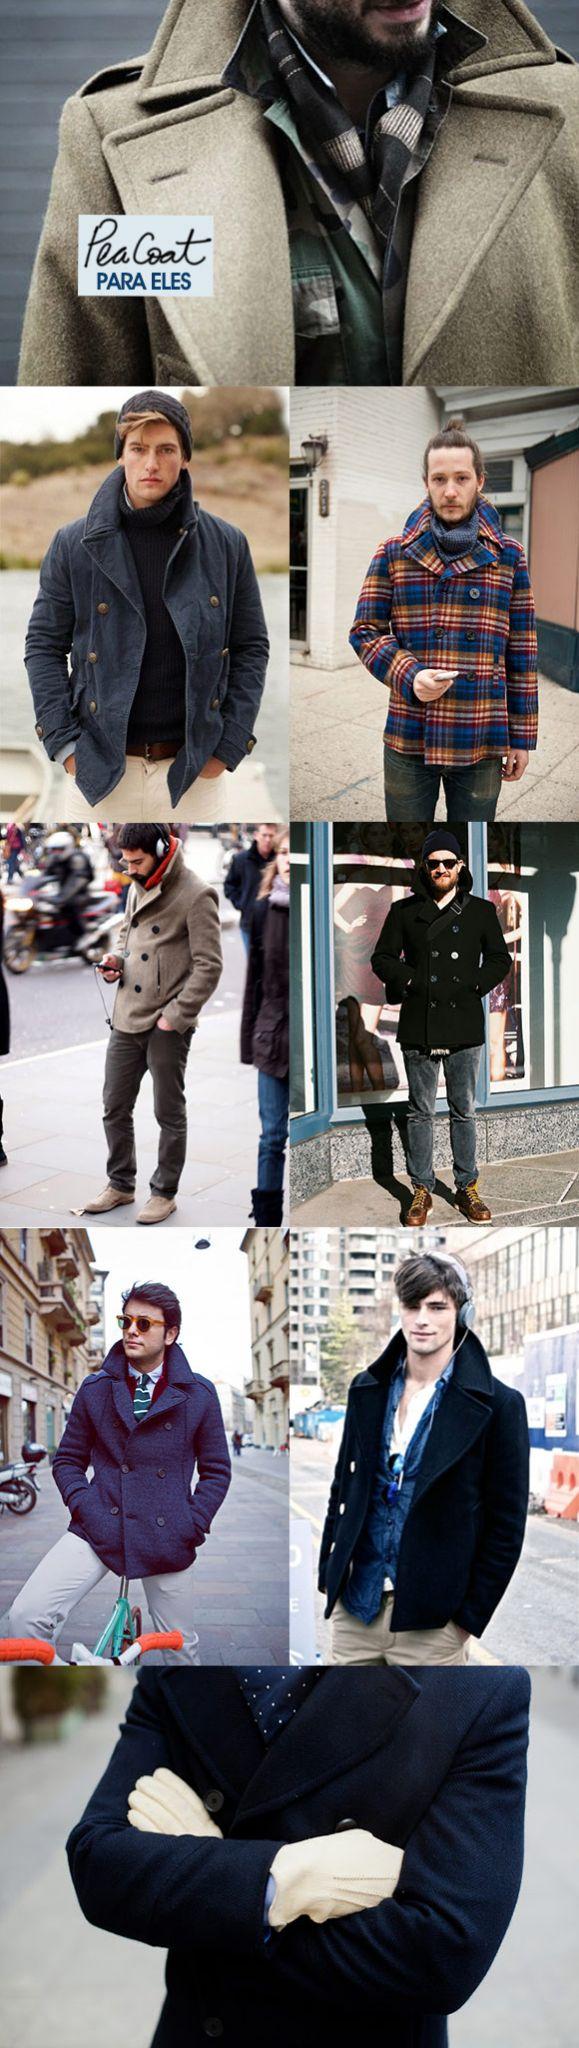 Moda para eles: pea coat